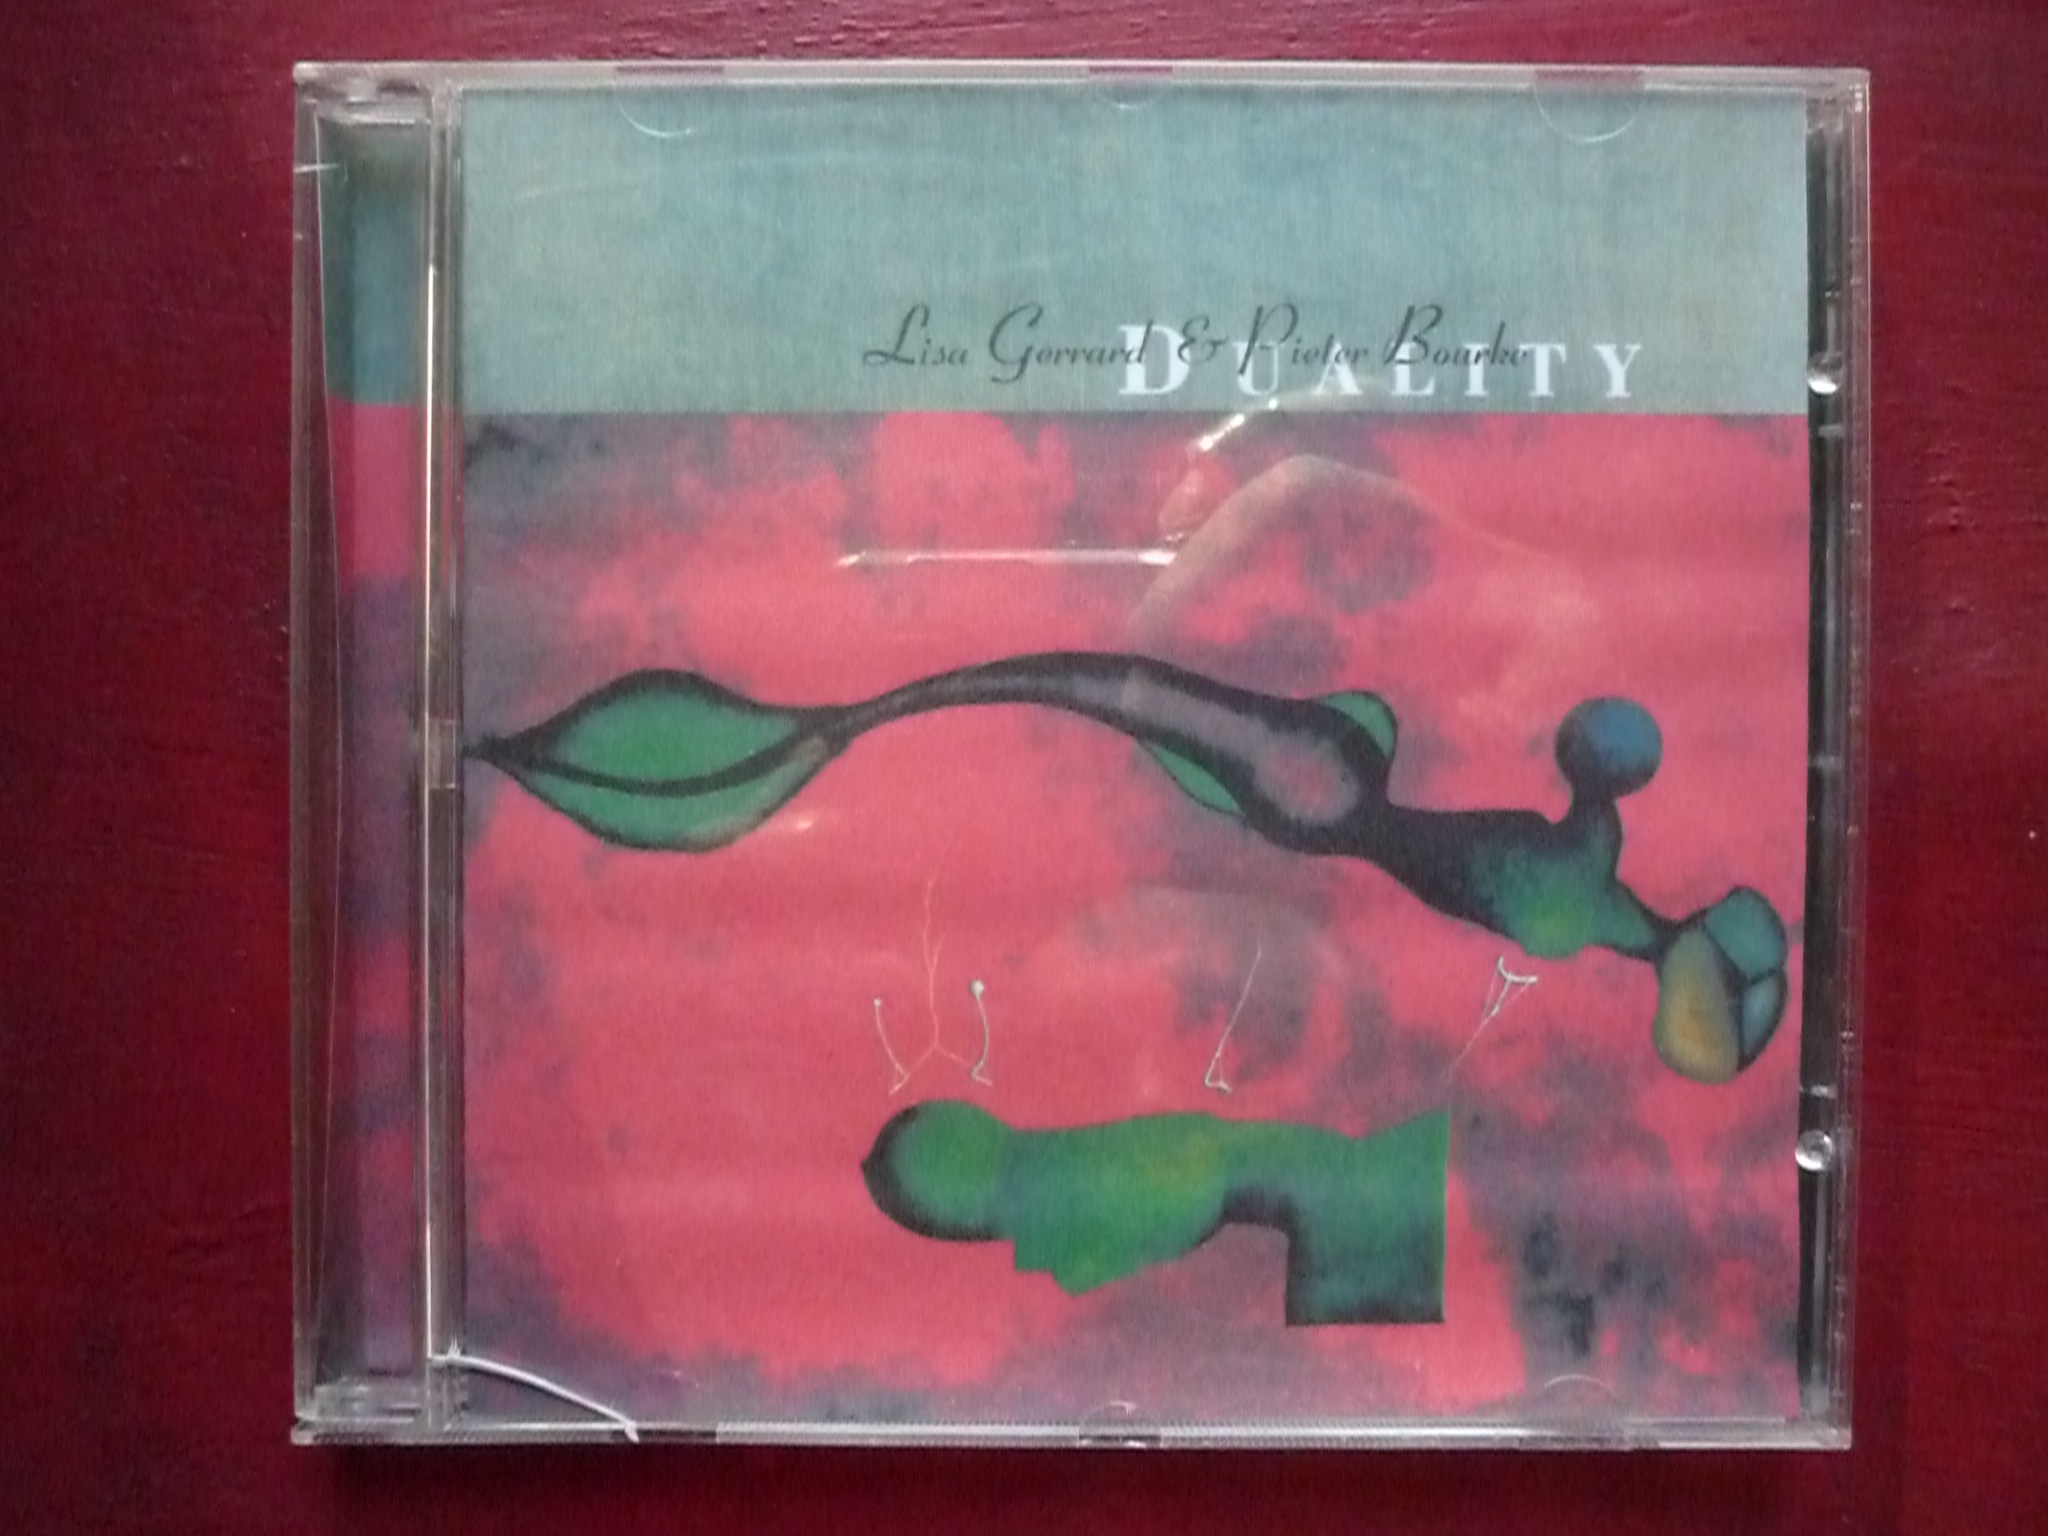 LISA GERRARD & PIETER BOURKE DUALITY CD